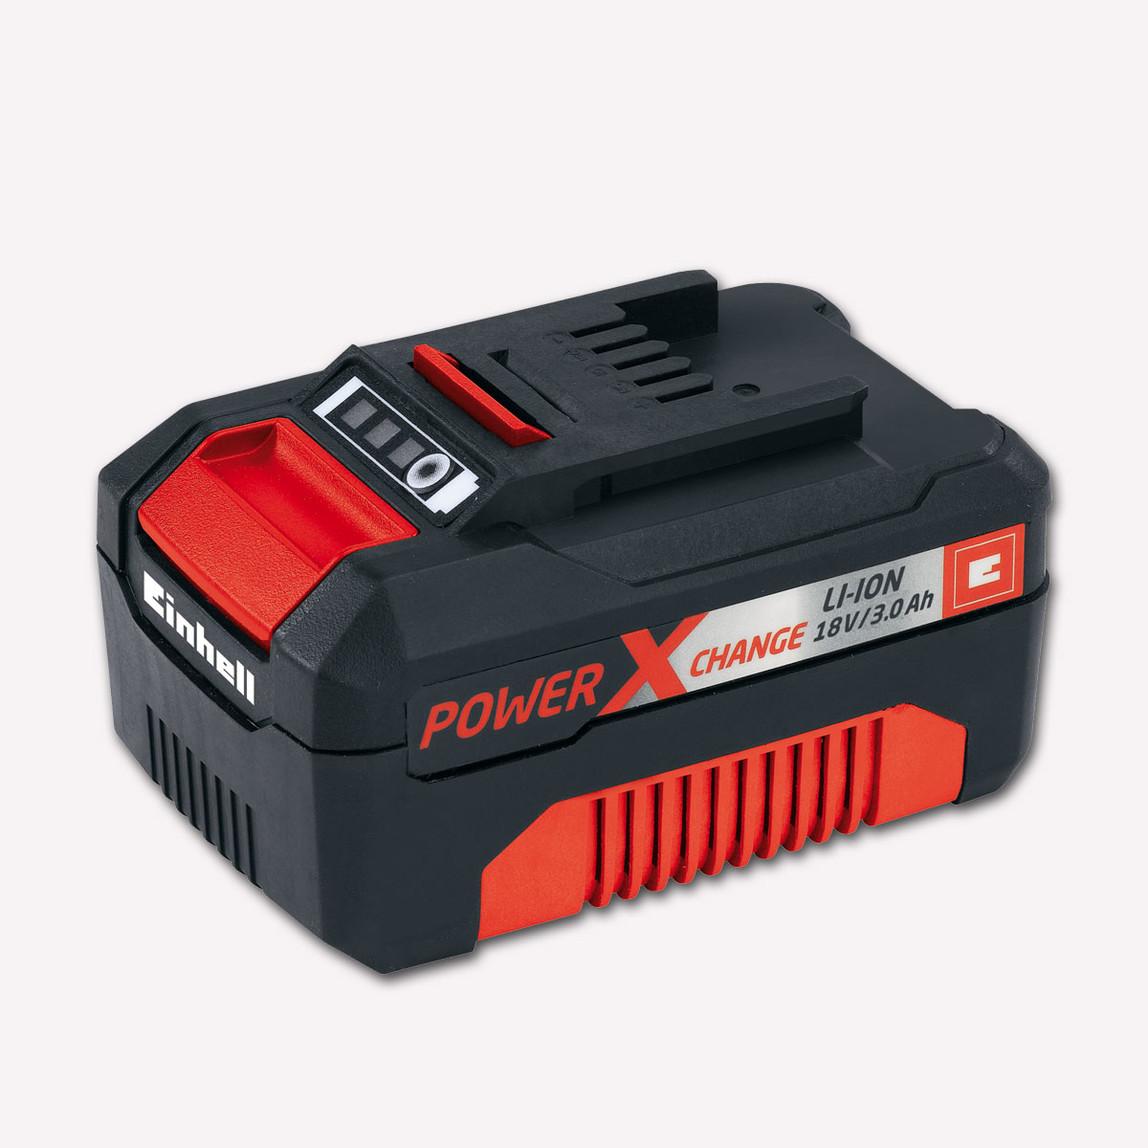 Einhell 18 V 3.0 Ah Power X-Change Li-ion Akü